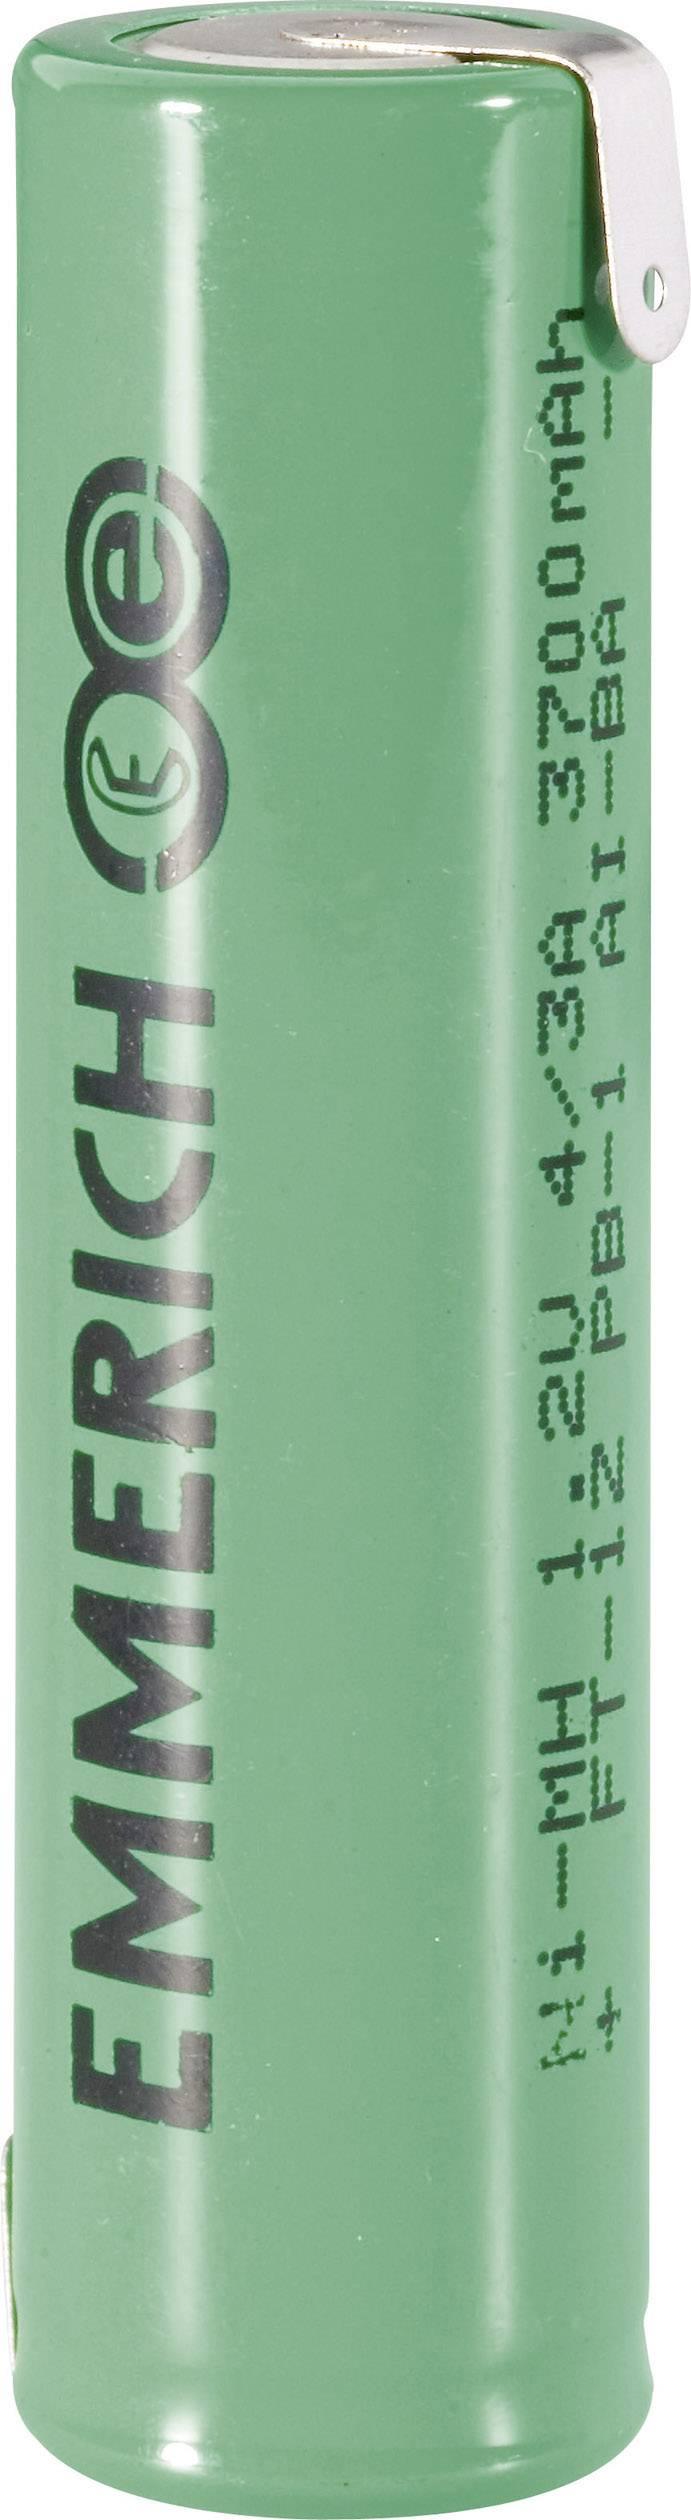 Emmerich NiMH-akumulátory so Z spájkovacími očkami 4/3 3700 mAh, FT-1Z